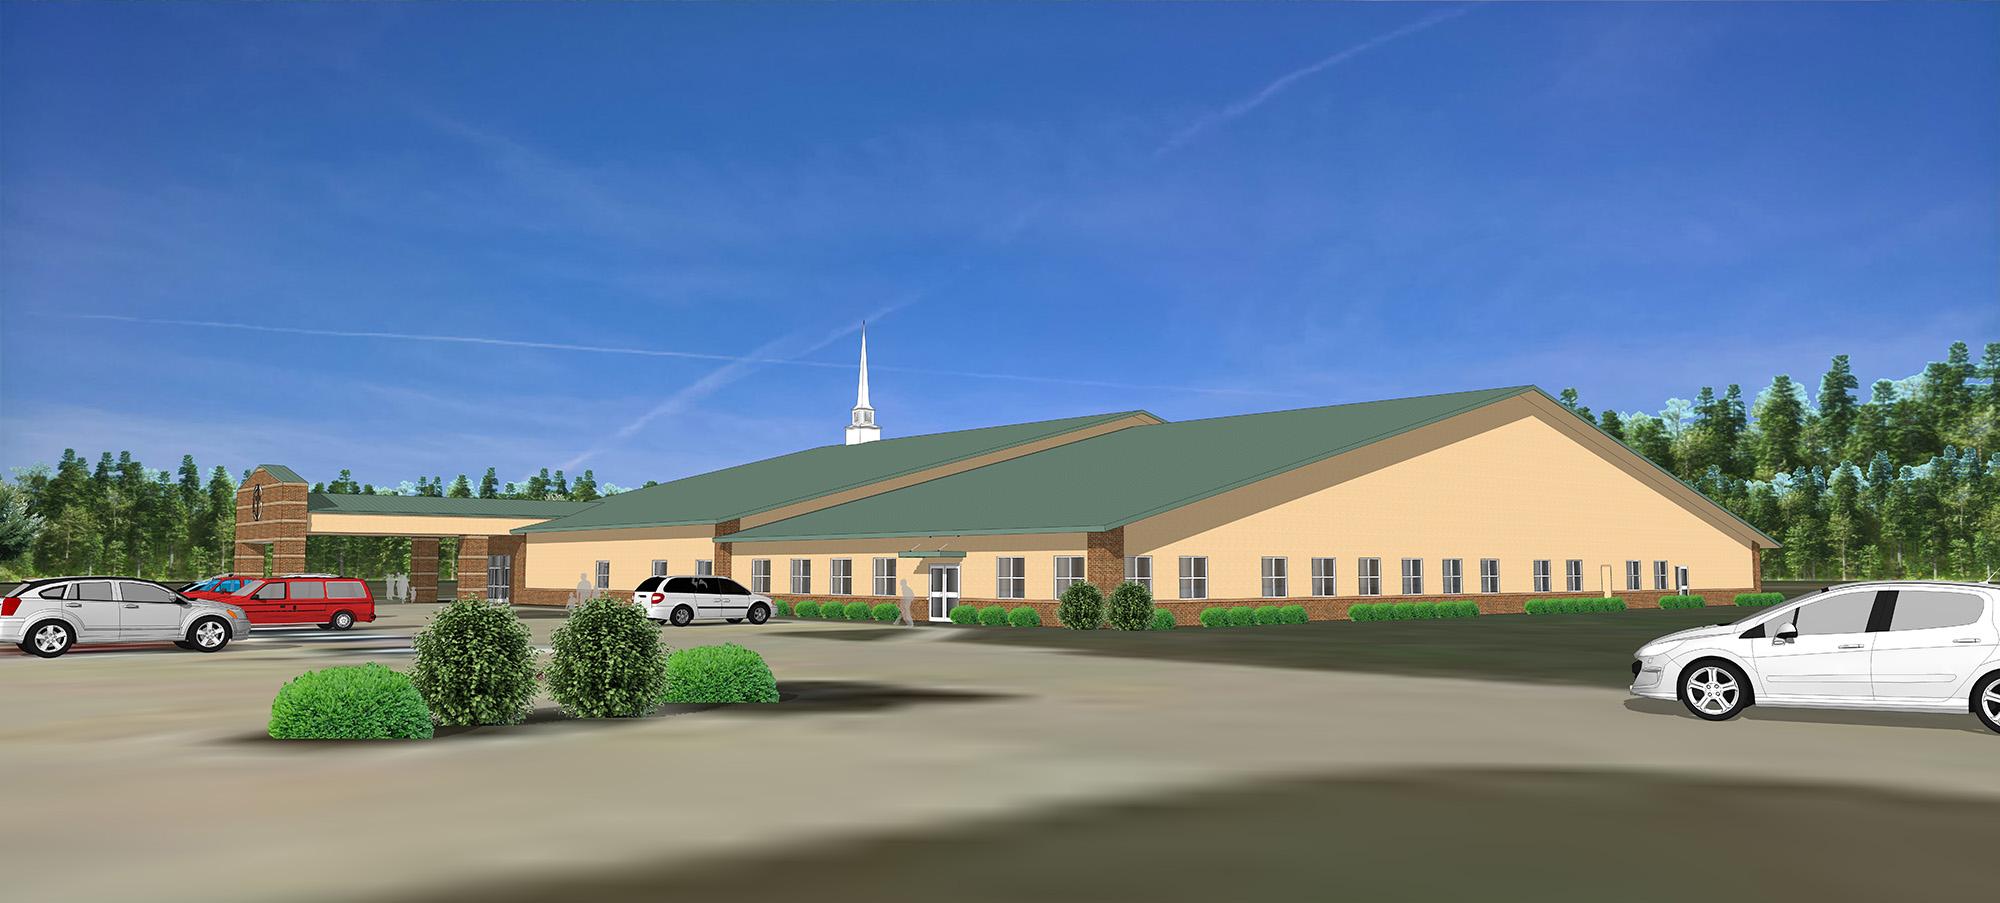 grace-community-church-architect.jpg